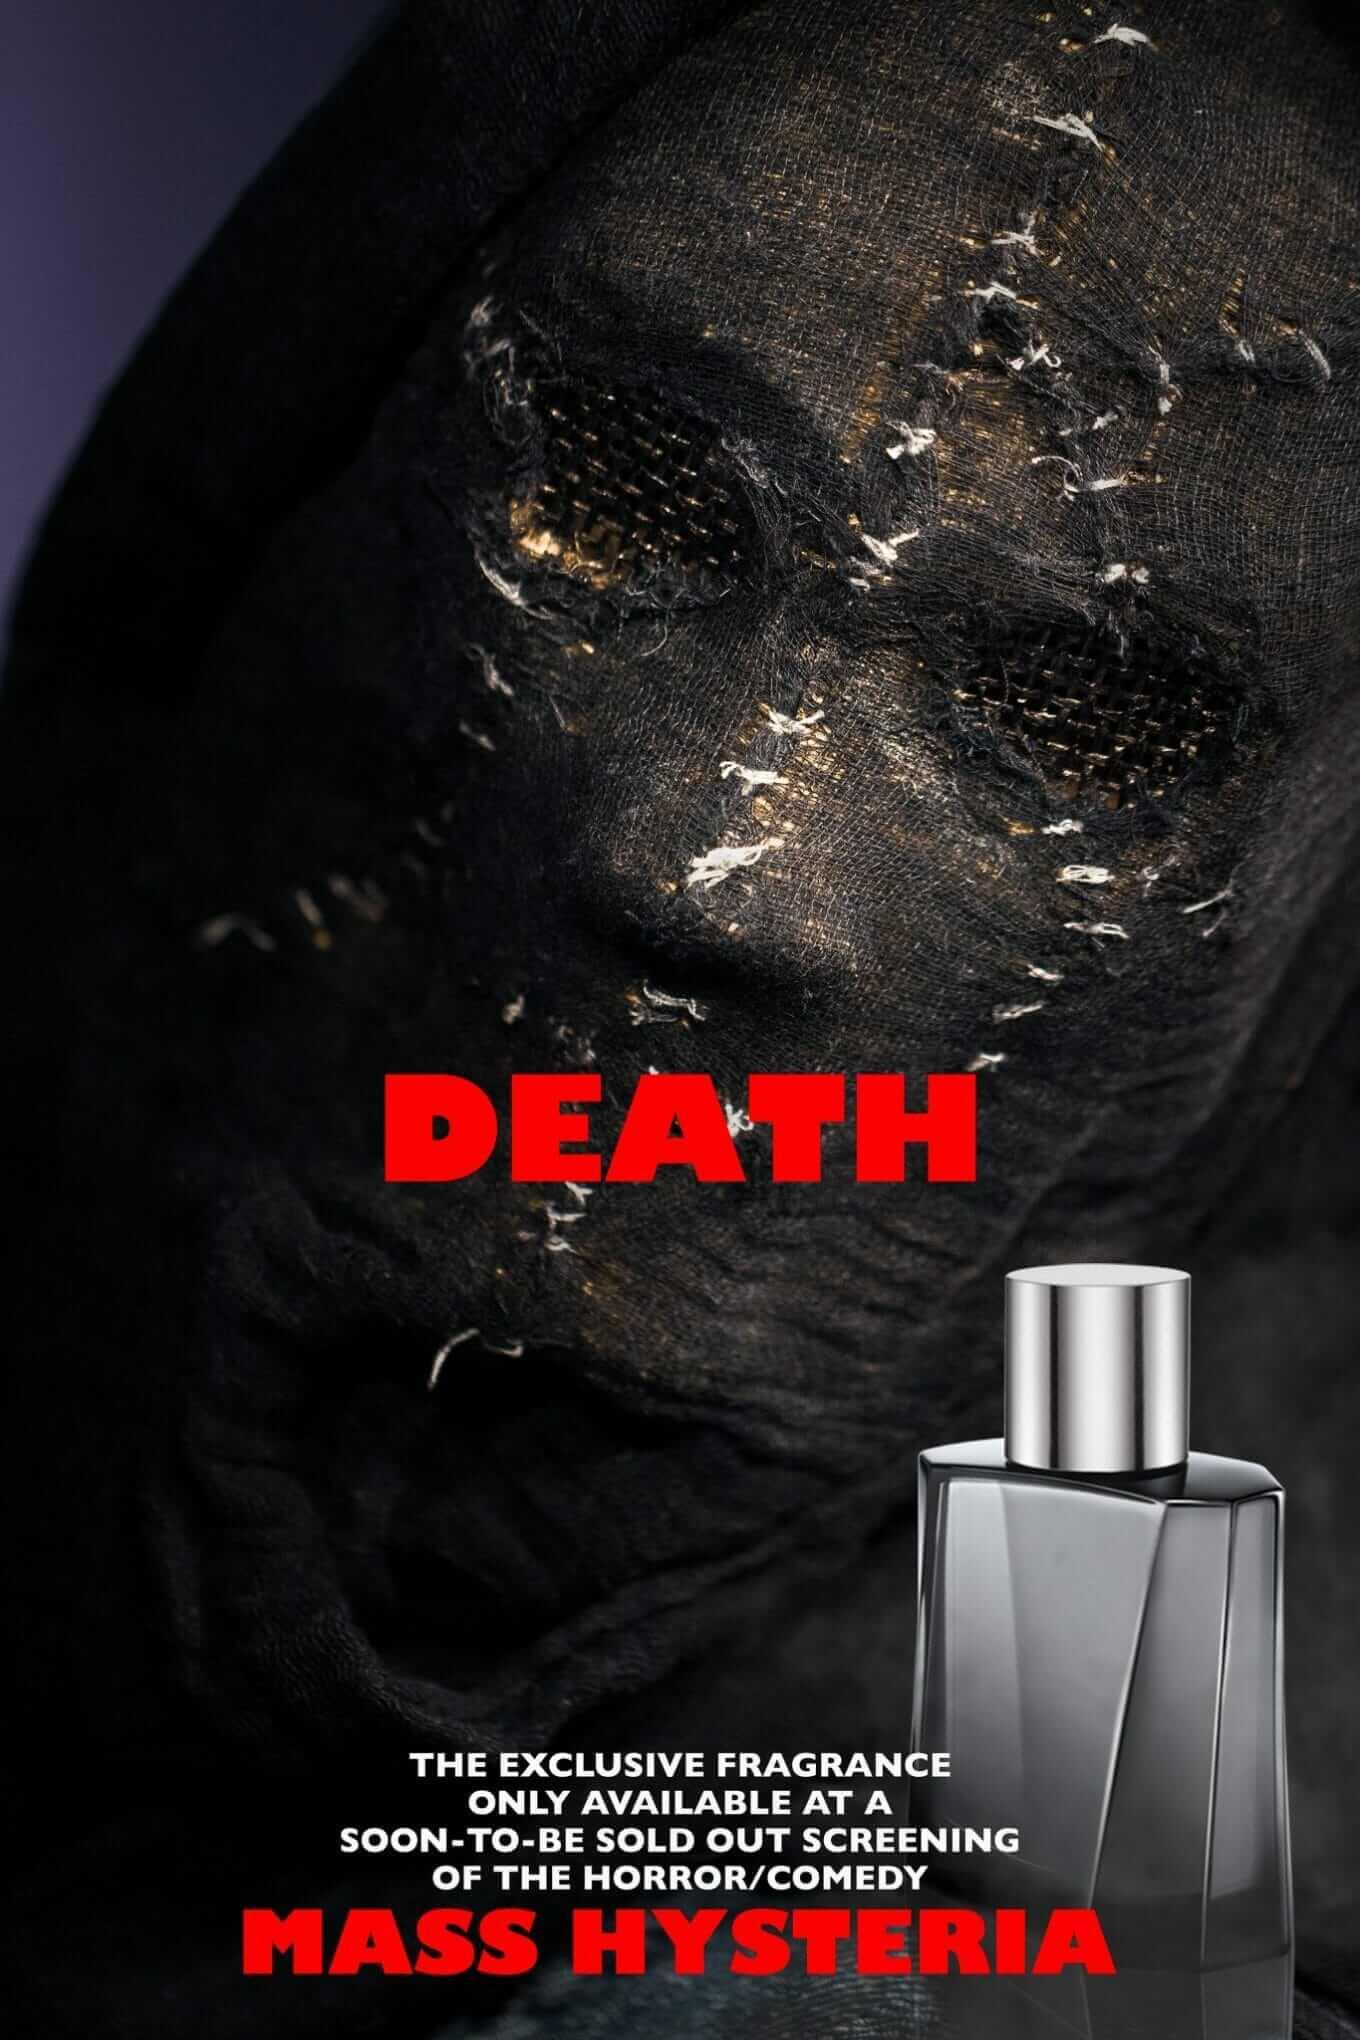 [Review] Salem Set Horror-Comedy MASS HYSTERIA is a Quick Shot of Halloween Fun